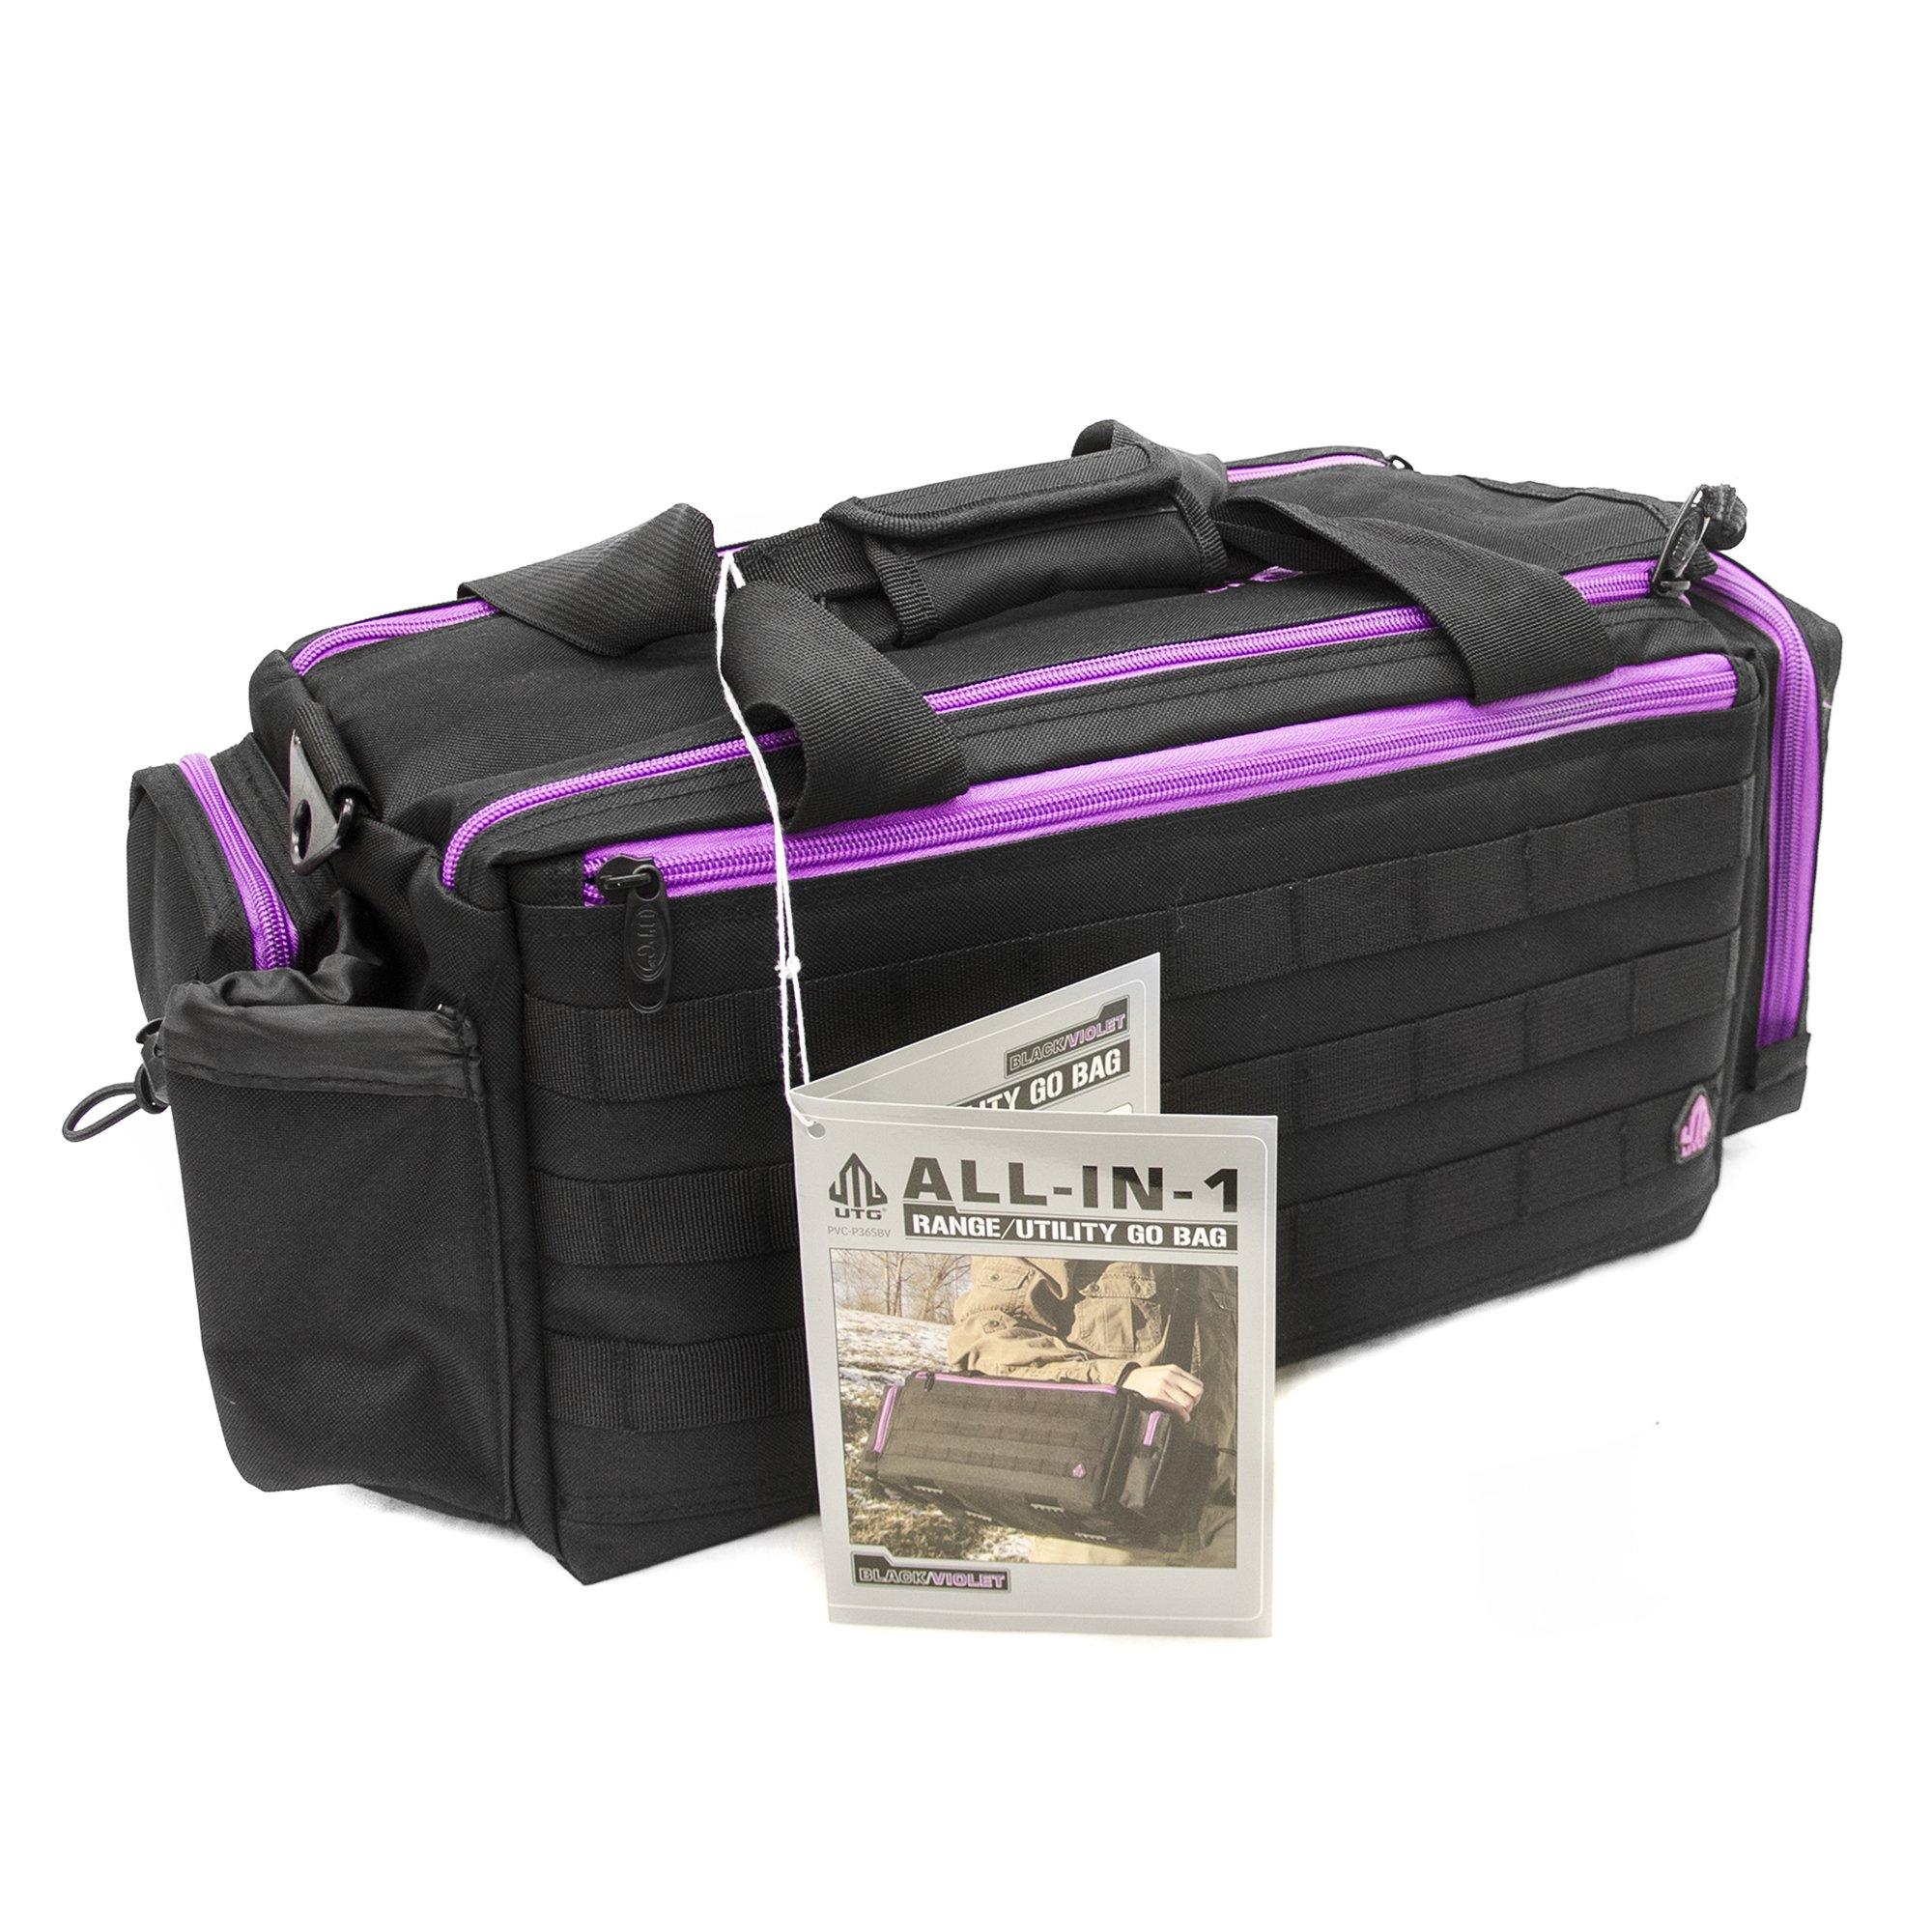 UTG All in One Range/Utility Go Bag, Black/Violet, 21'' x 10'' x 9'' by UTG (Image #15)